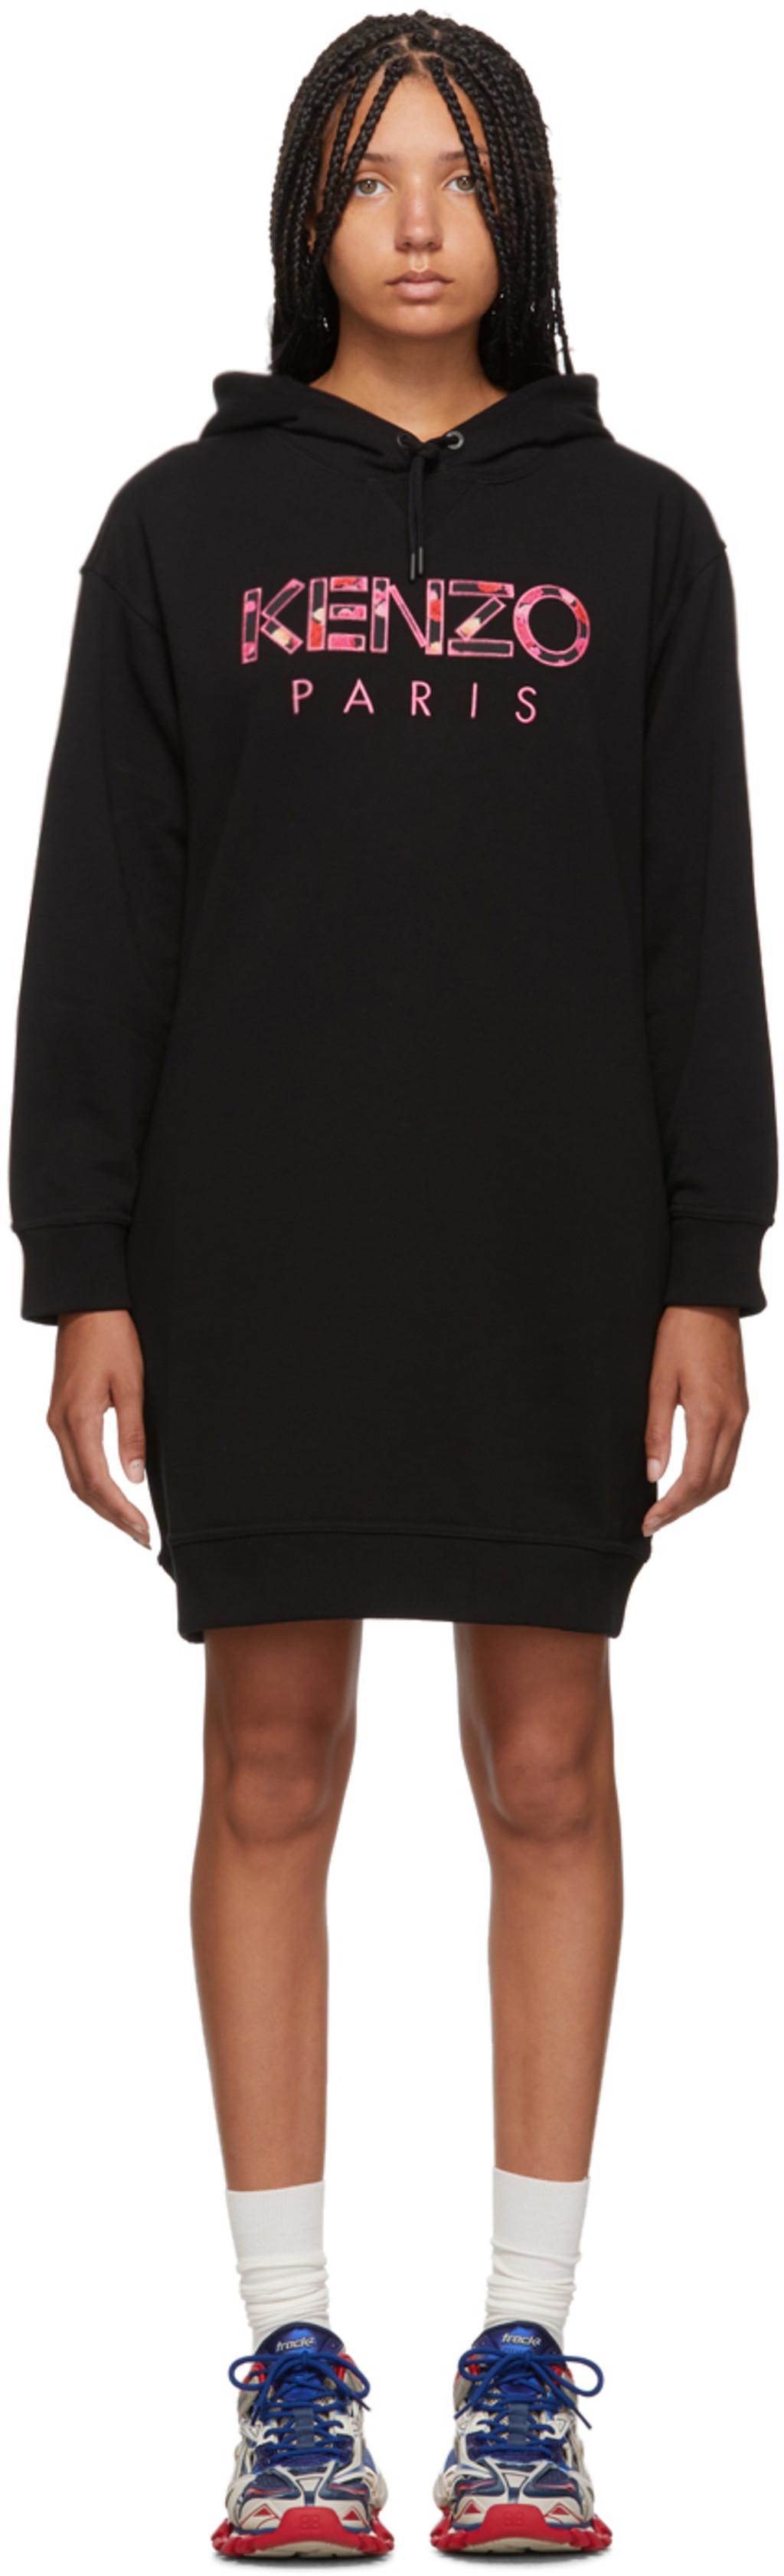 6d51164b88 Black 'Kenzo Paris' Peony Sweatshirt Dress